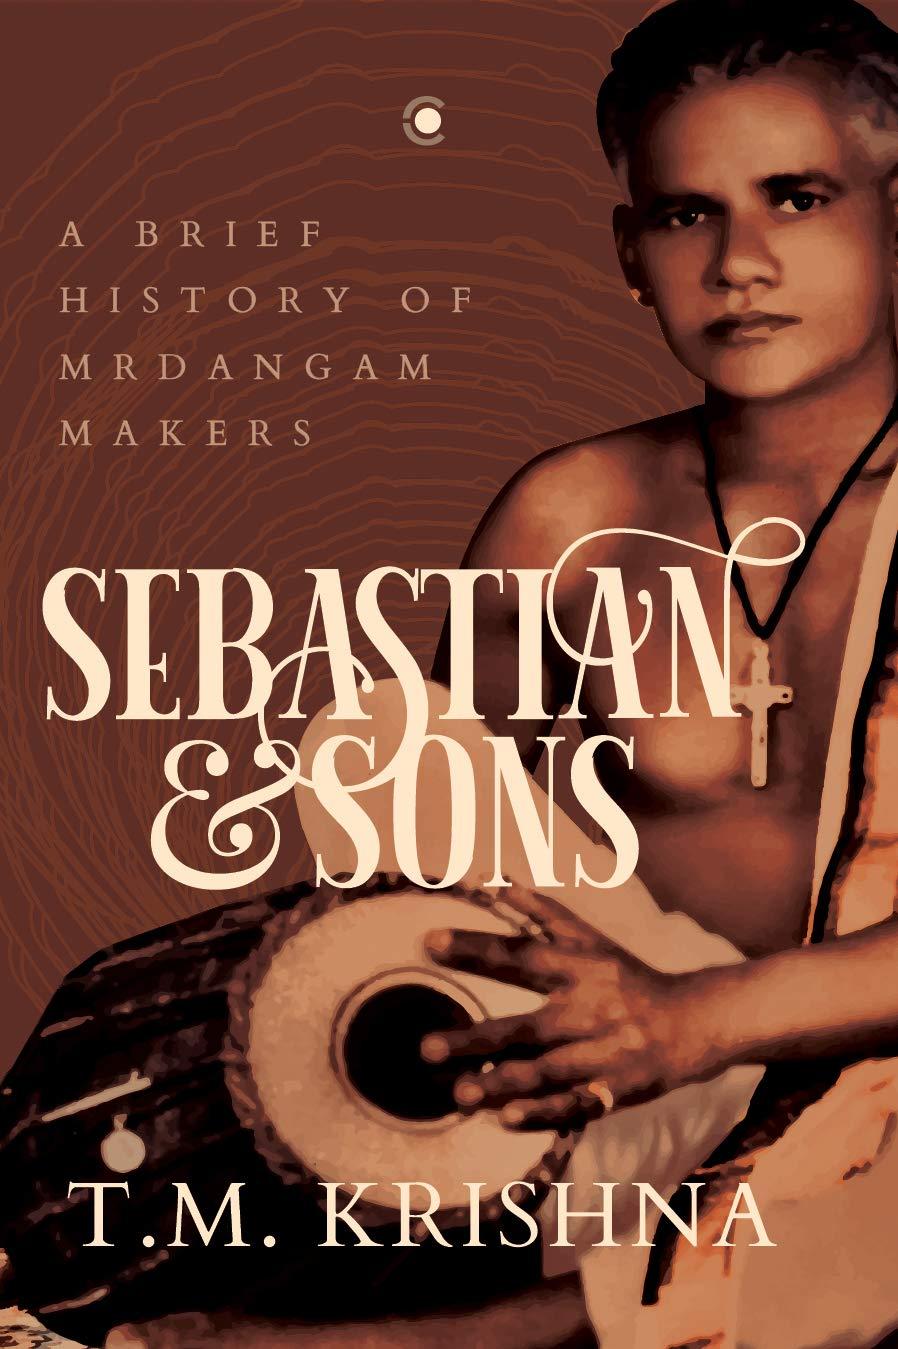 Sebastian & Sons: A brief history of mrdangam makers byT.M. Krishna,Context, Rs 799